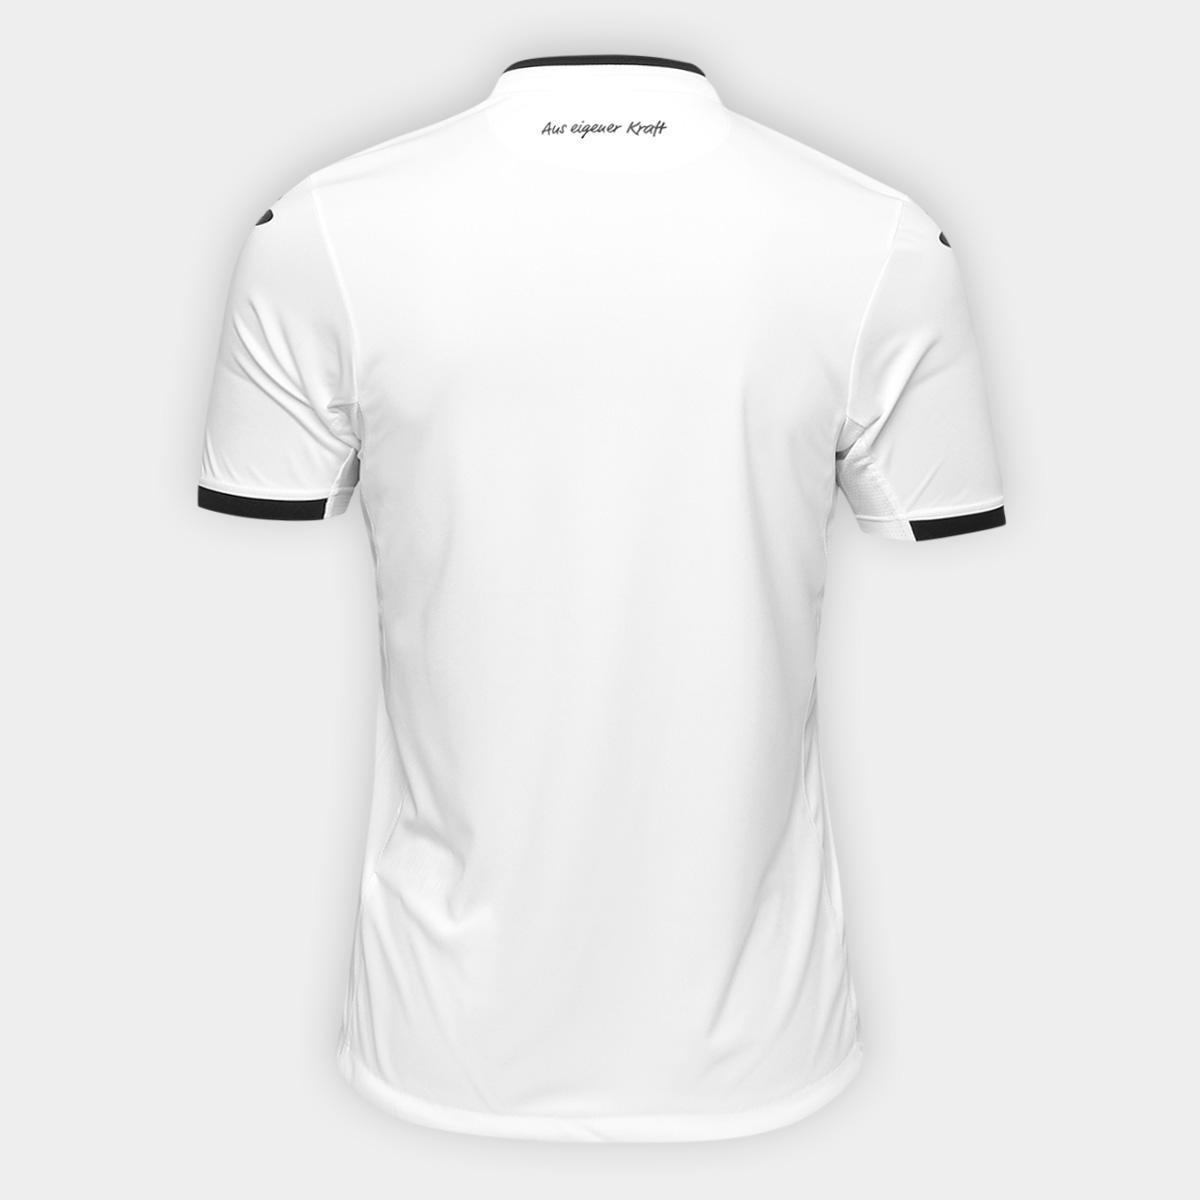 9cce8bdafc6bf camisa fsv frankfurt away 2017 s nº torcedor joma masculina. Carregando  zoom.